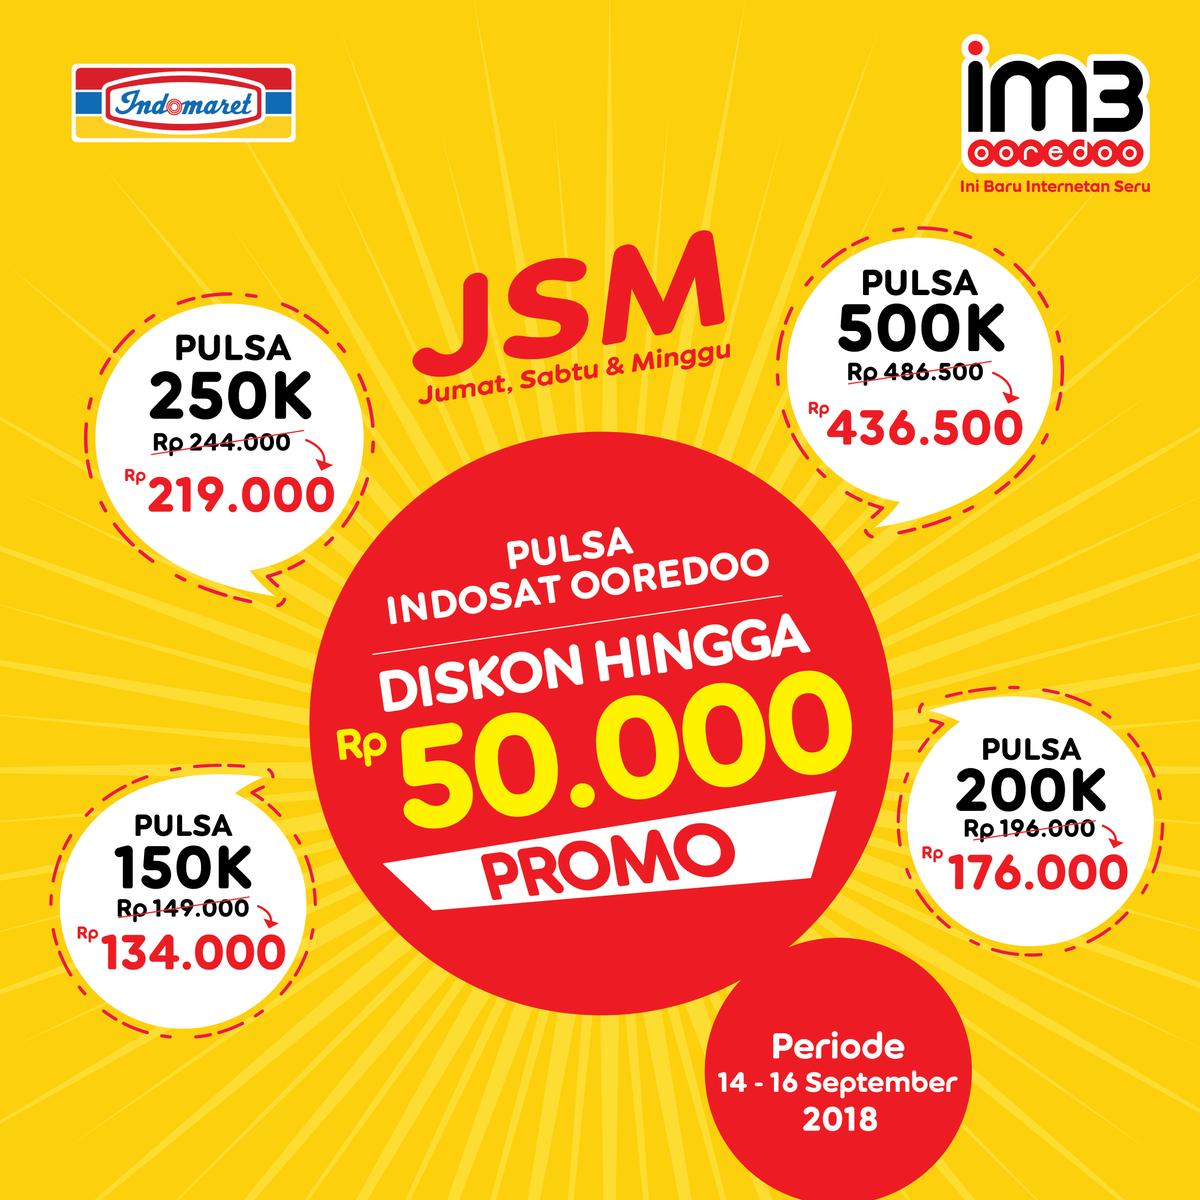 Indomaret - Promo JSM Pulsa Indosat Diskon s.d 50 Ribu (s.d 16 Sept 2018)